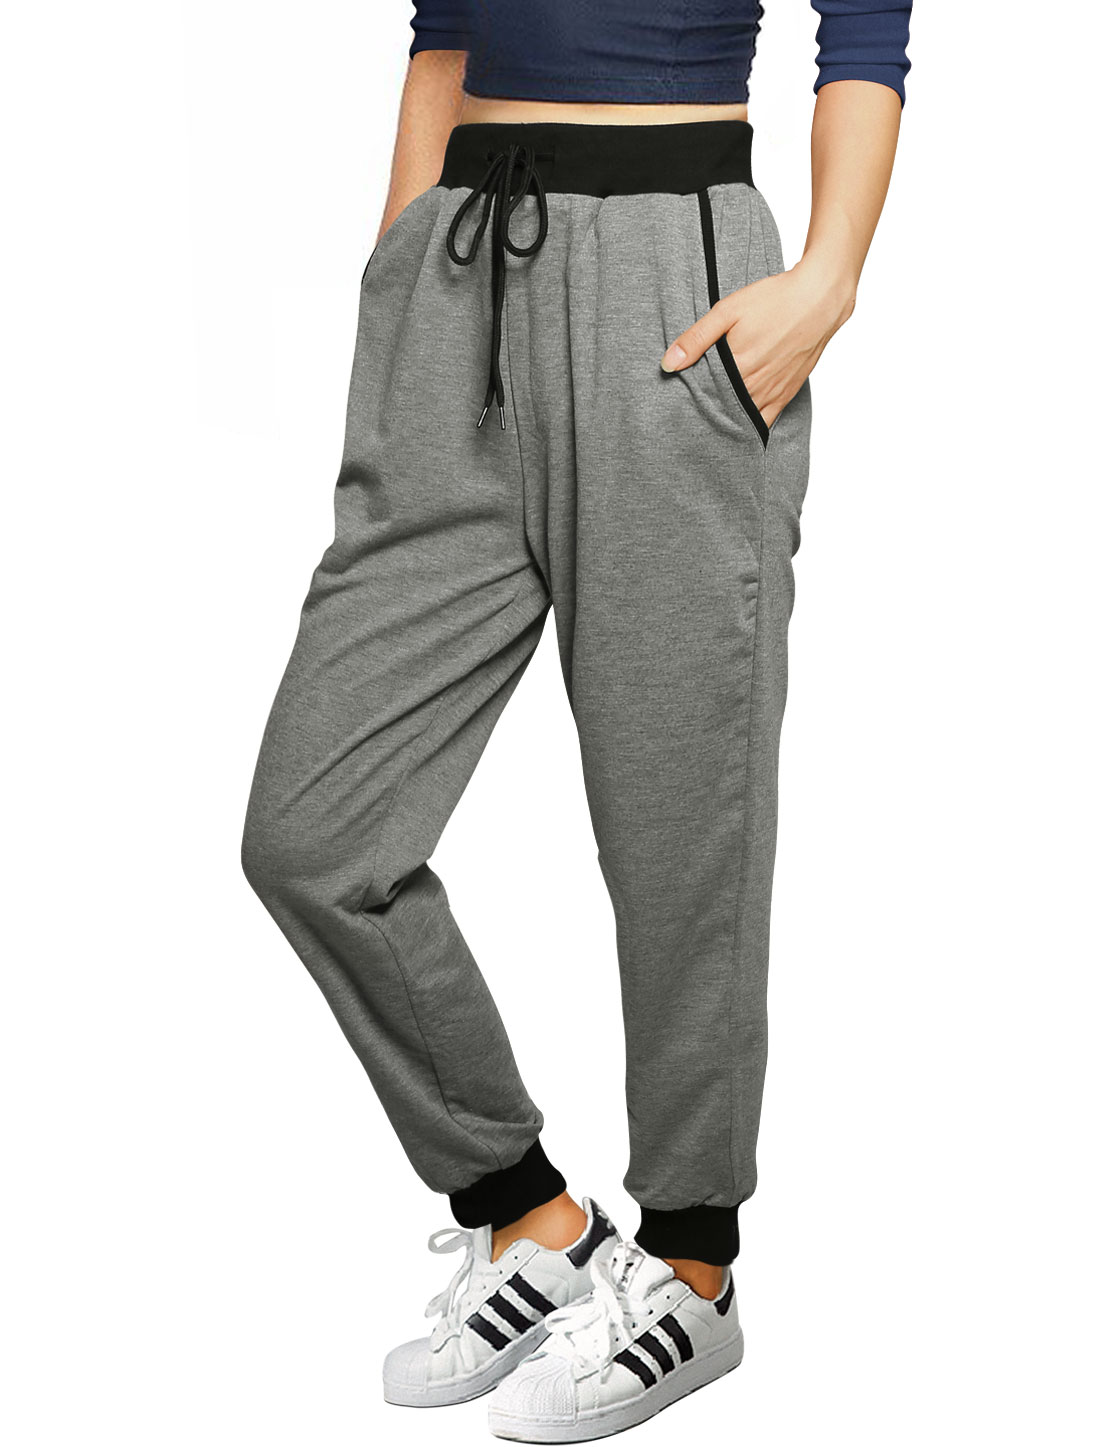 Allegra K Ladies Drawstring Waist Slant Pockets Slim Fit Jogging Pants Gray L